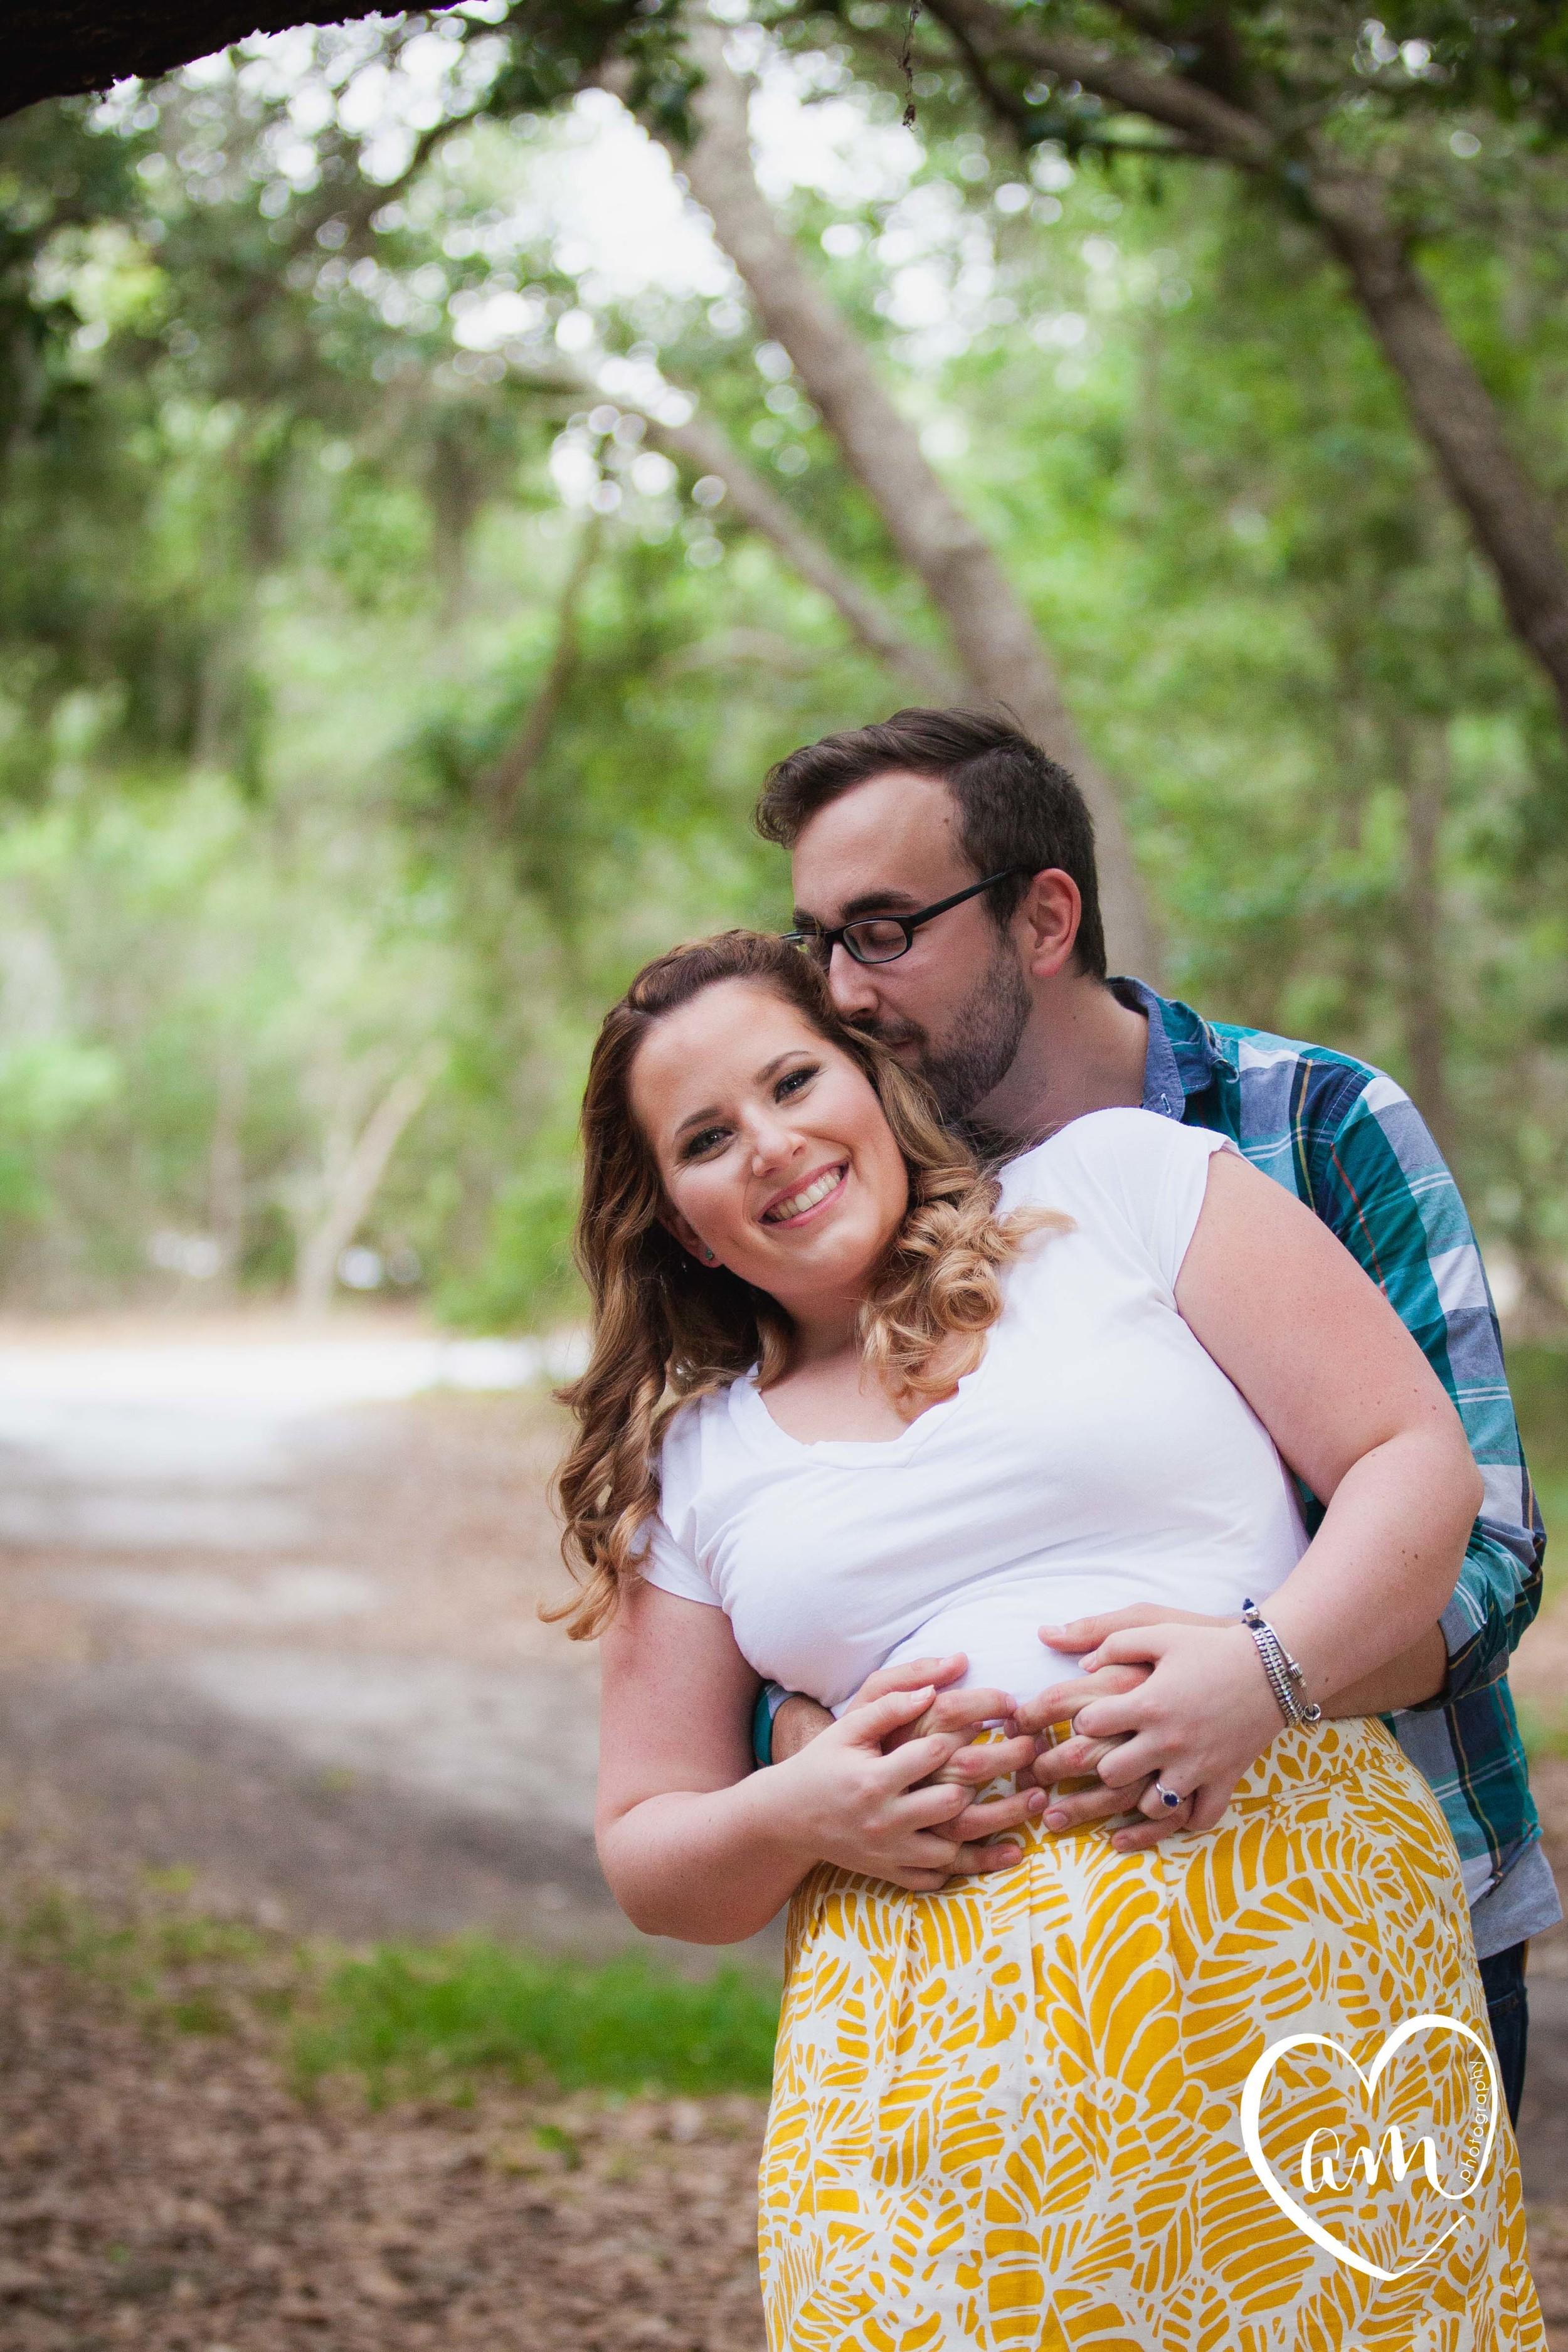 Fun filled engagement photos taken by Orlando destination wedding photographer